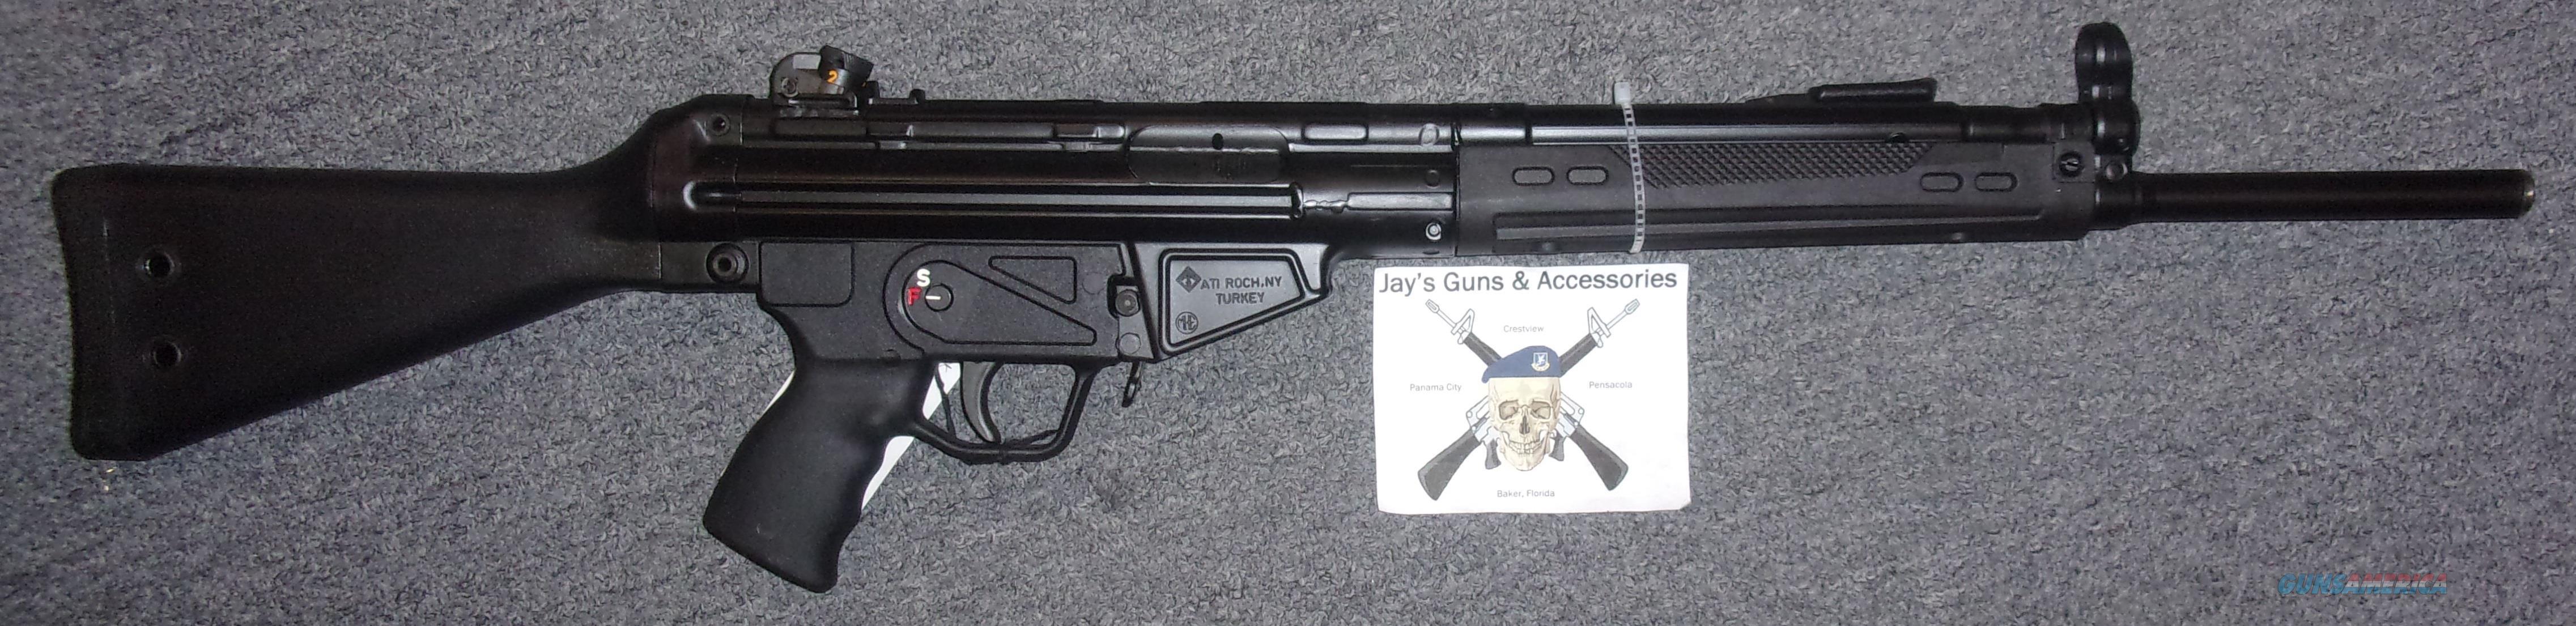 ATI MKE AT-43  Guns > Rifles > American Tactical Imports Rifles